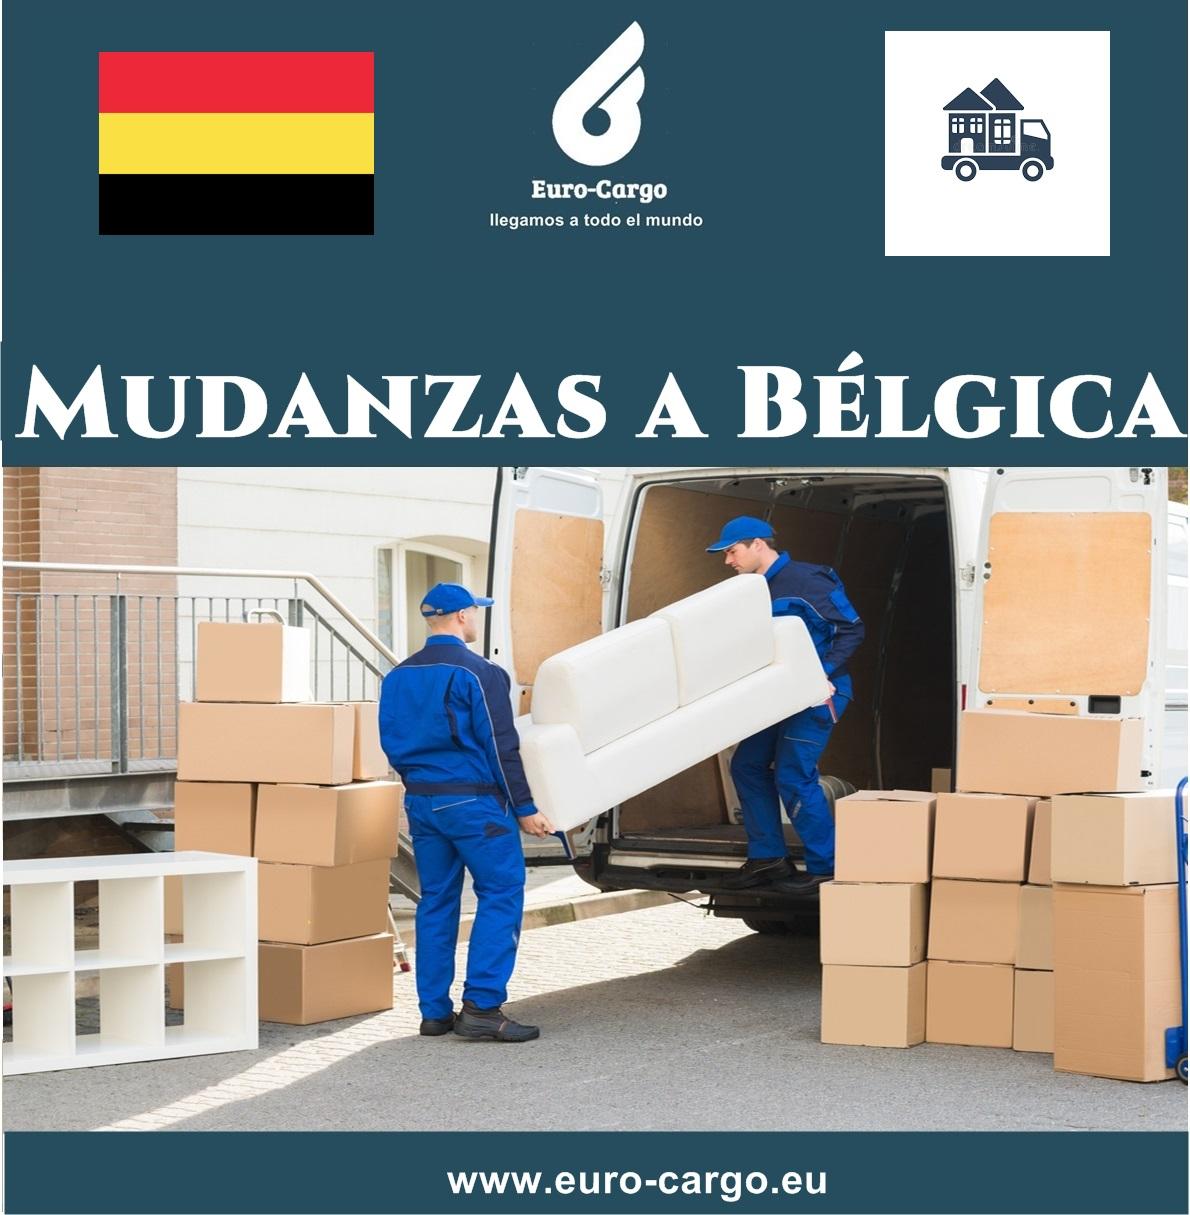 Mudanzas-a-Belgica.jpg